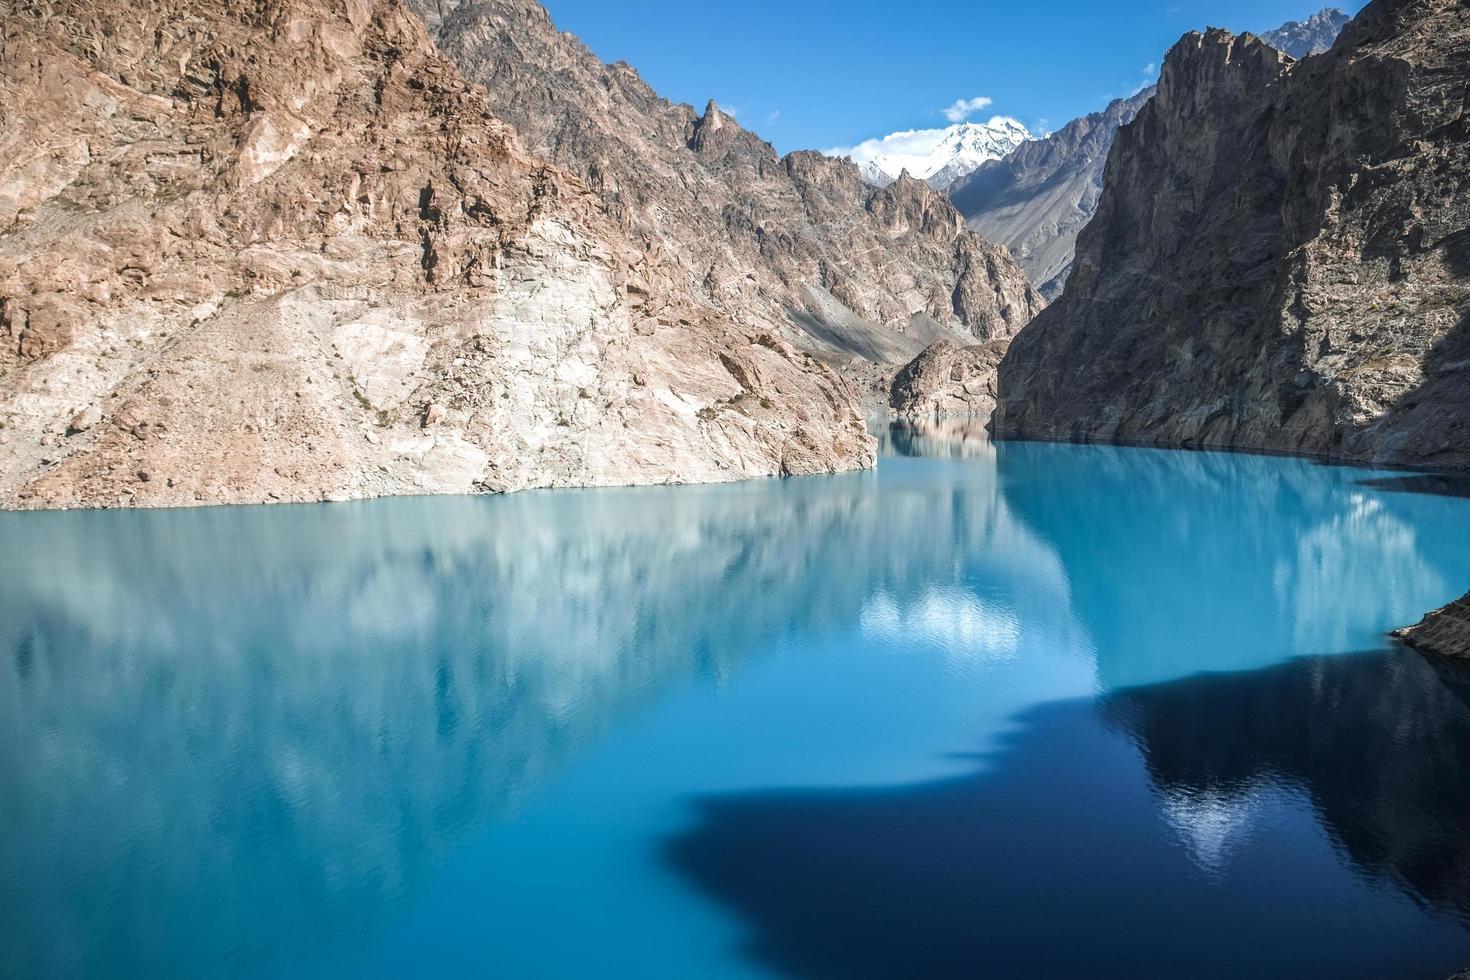 Attabad Lake in Karakoram mountain range, Pakistan photo